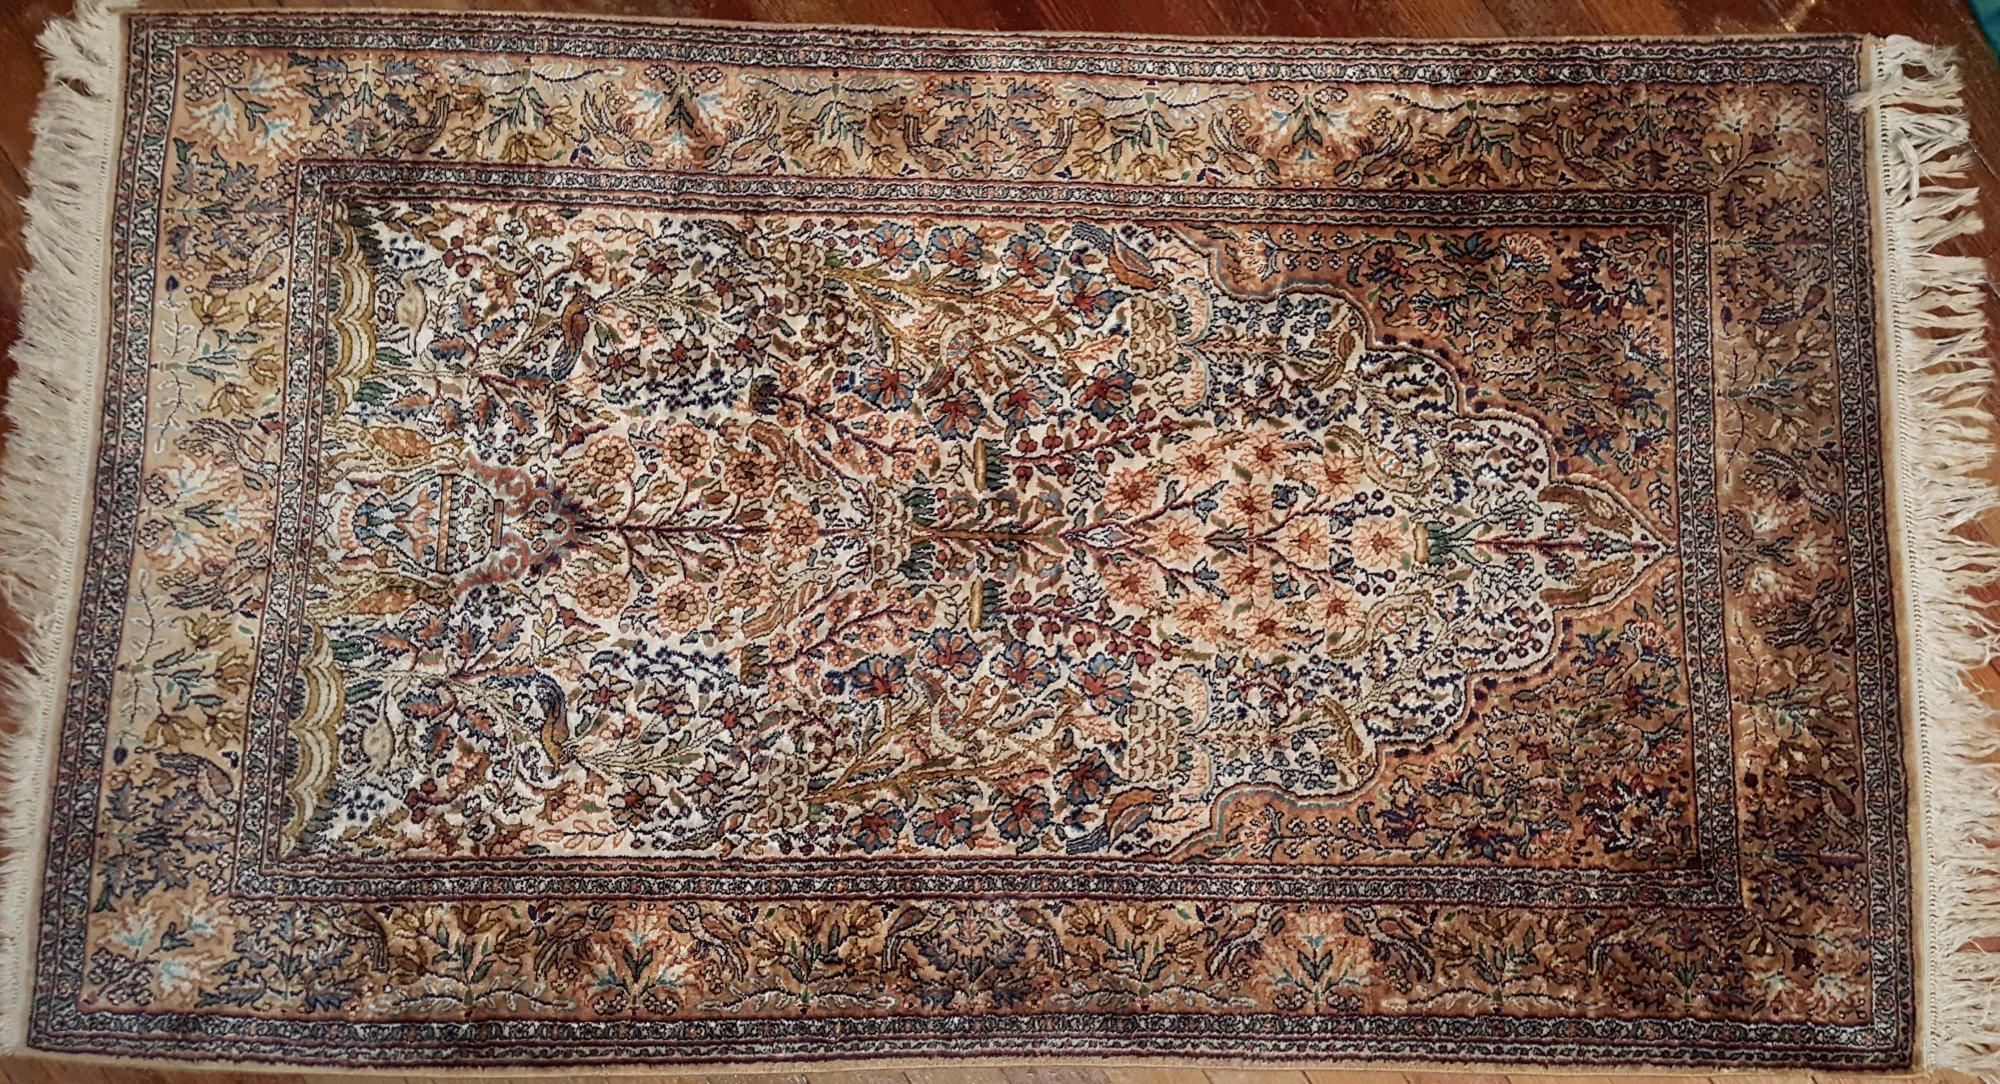 20th Century Middle Eastern Persian Silk Qum rug